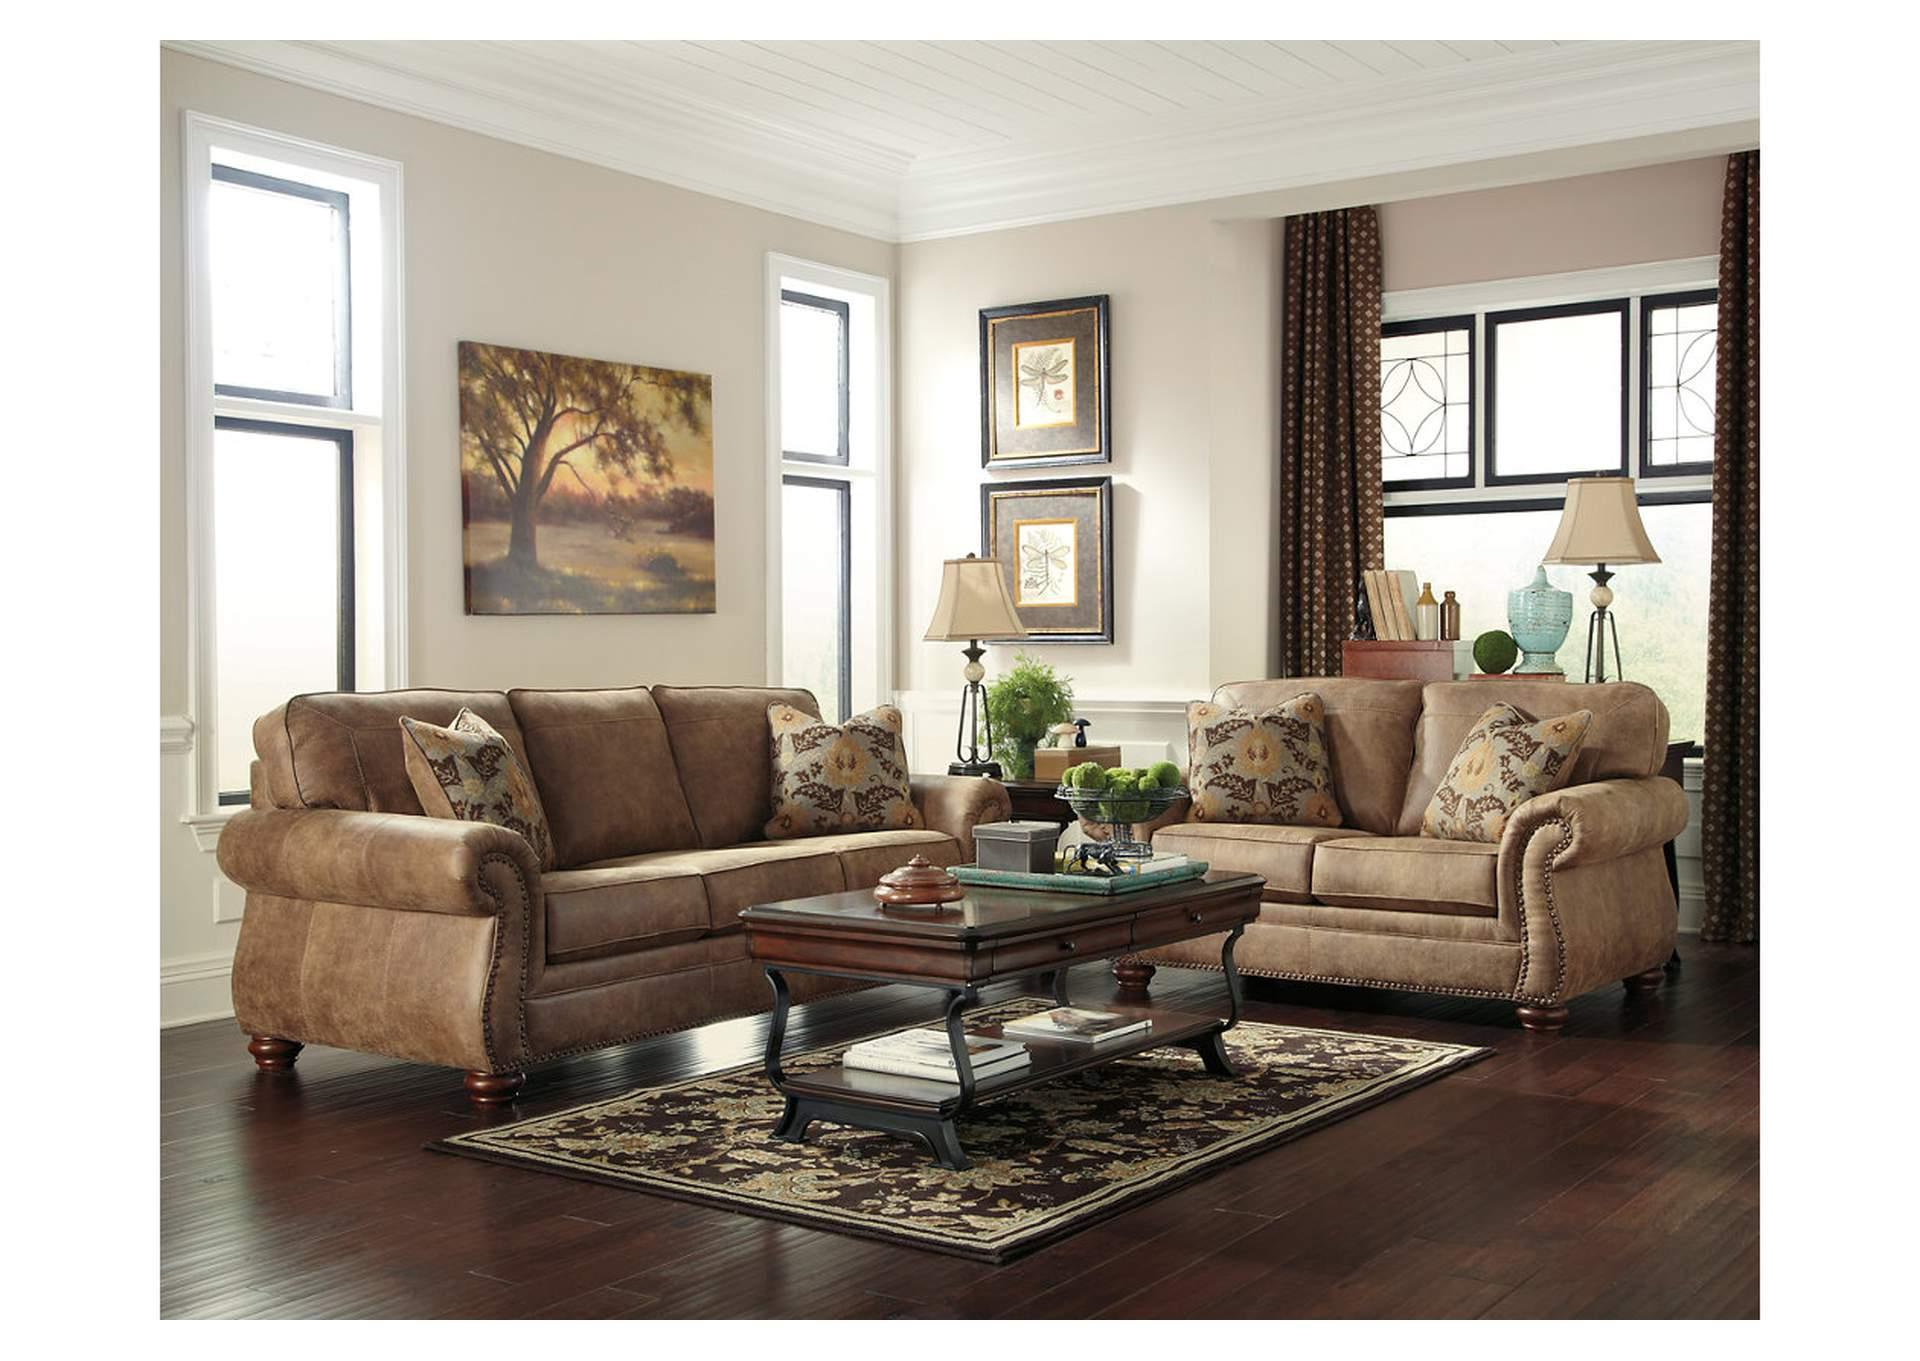 Affordable Furniture Houston, TX Cheap, Bargain Furniture - living room furniture houston